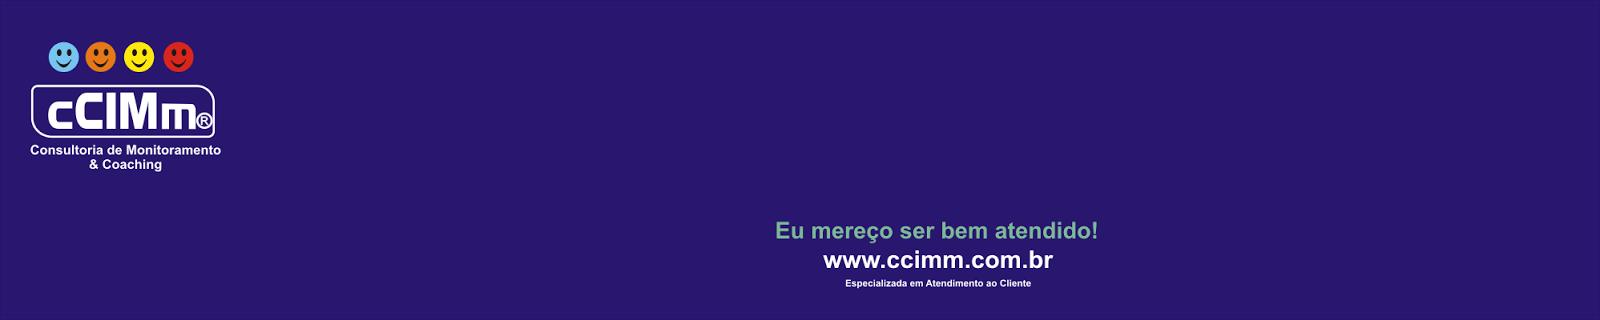 cCIMm Treinamento Empresarial e Coaching